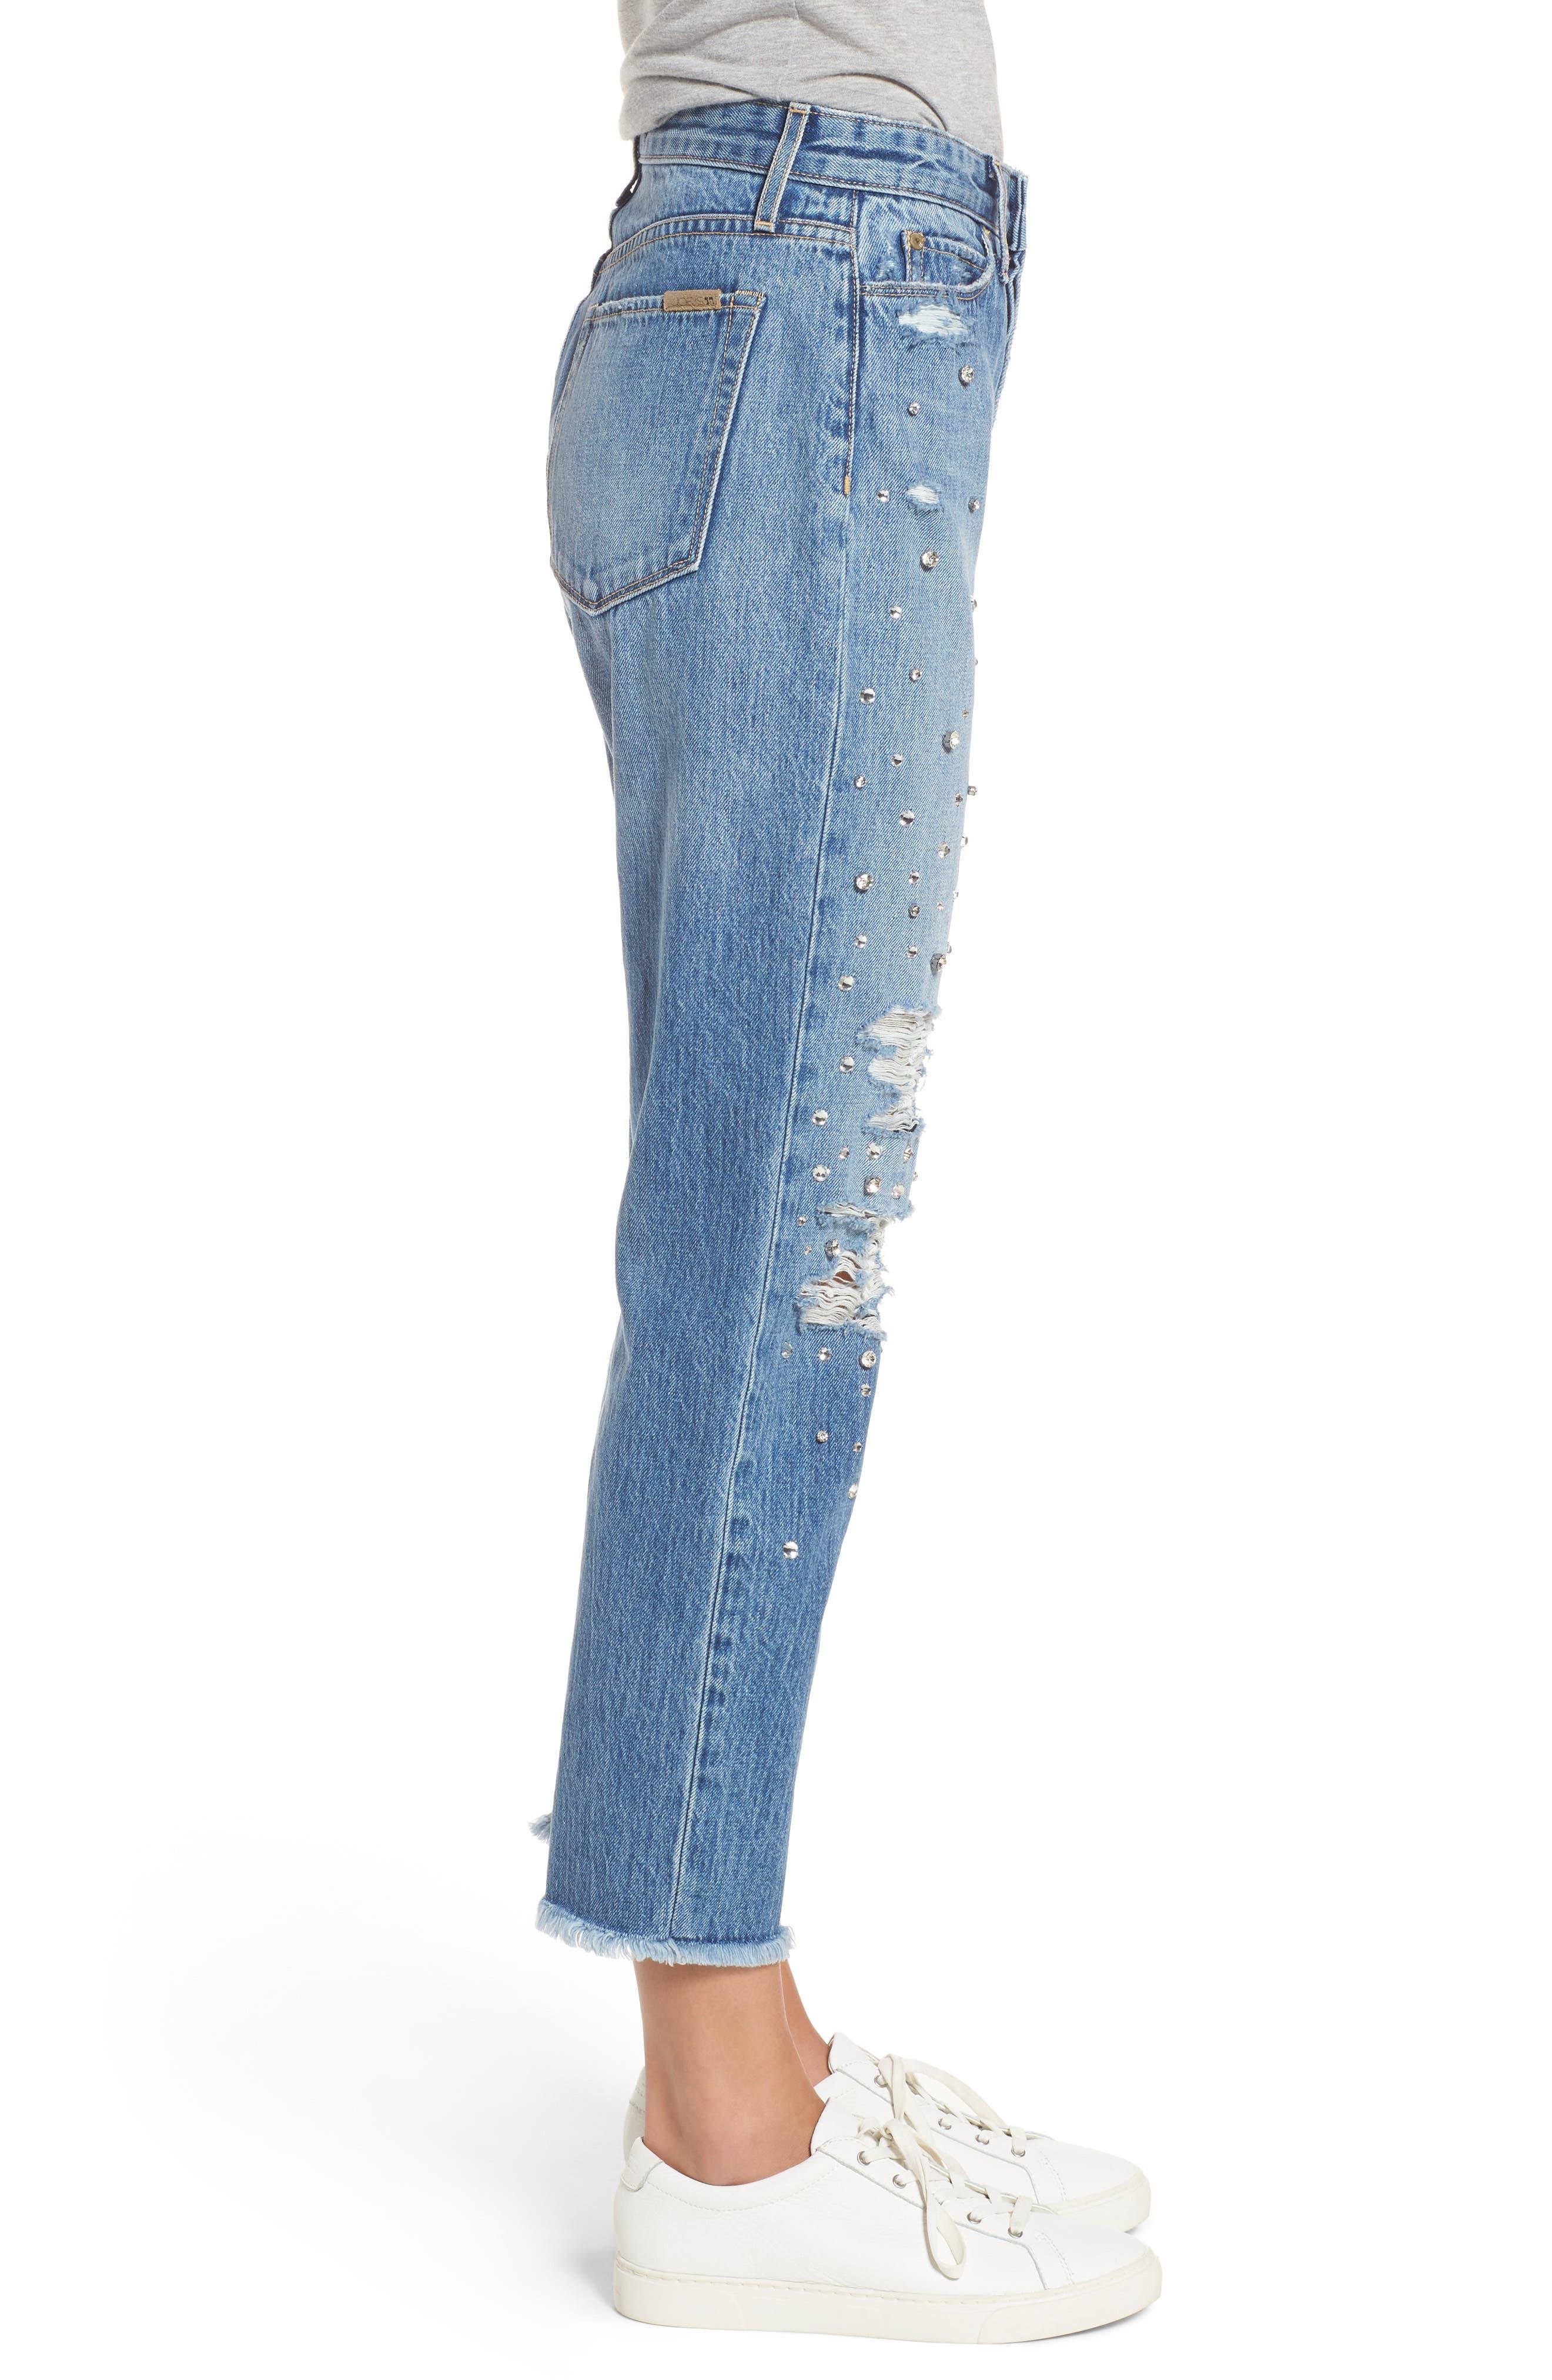 Jeans Smith Rhinestone Crop Boyfriend Jeans,                             Alternate thumbnail 3, color,                             450